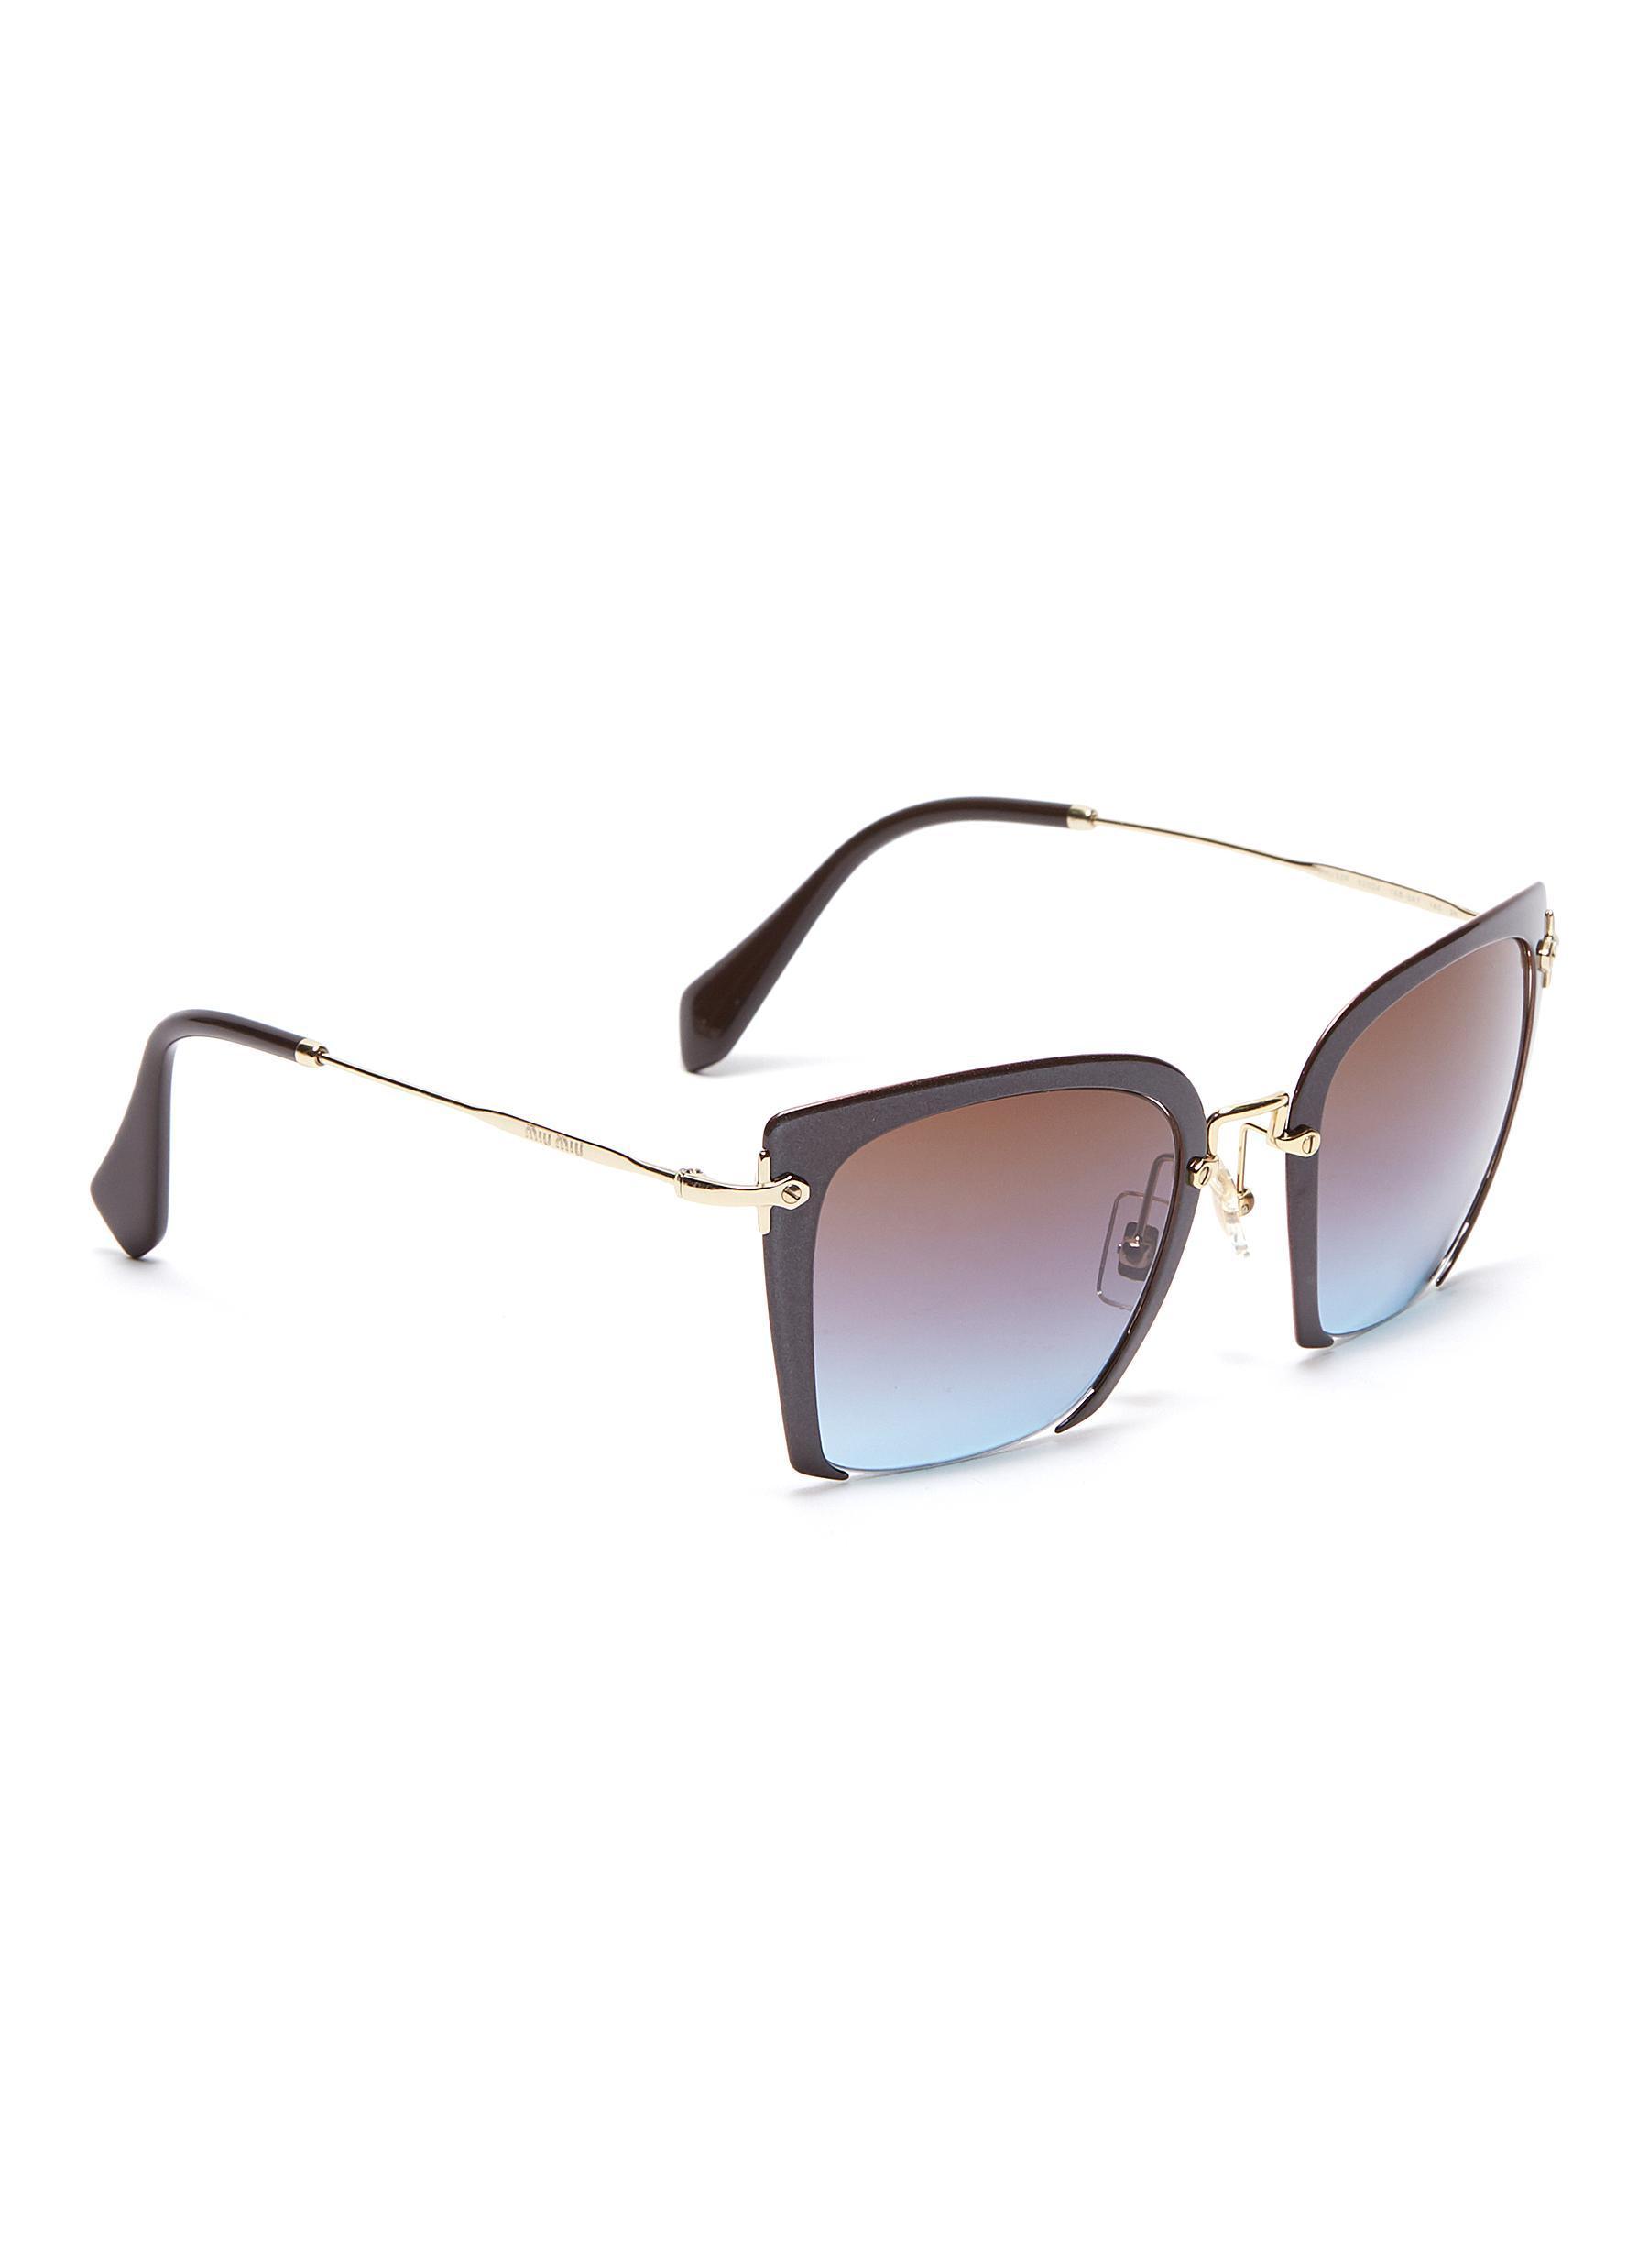 41018f8c6f7 Miu Miu - Brown Cutout Acetate Front Metal Square Sunglasses - Lyst. View  fullscreen